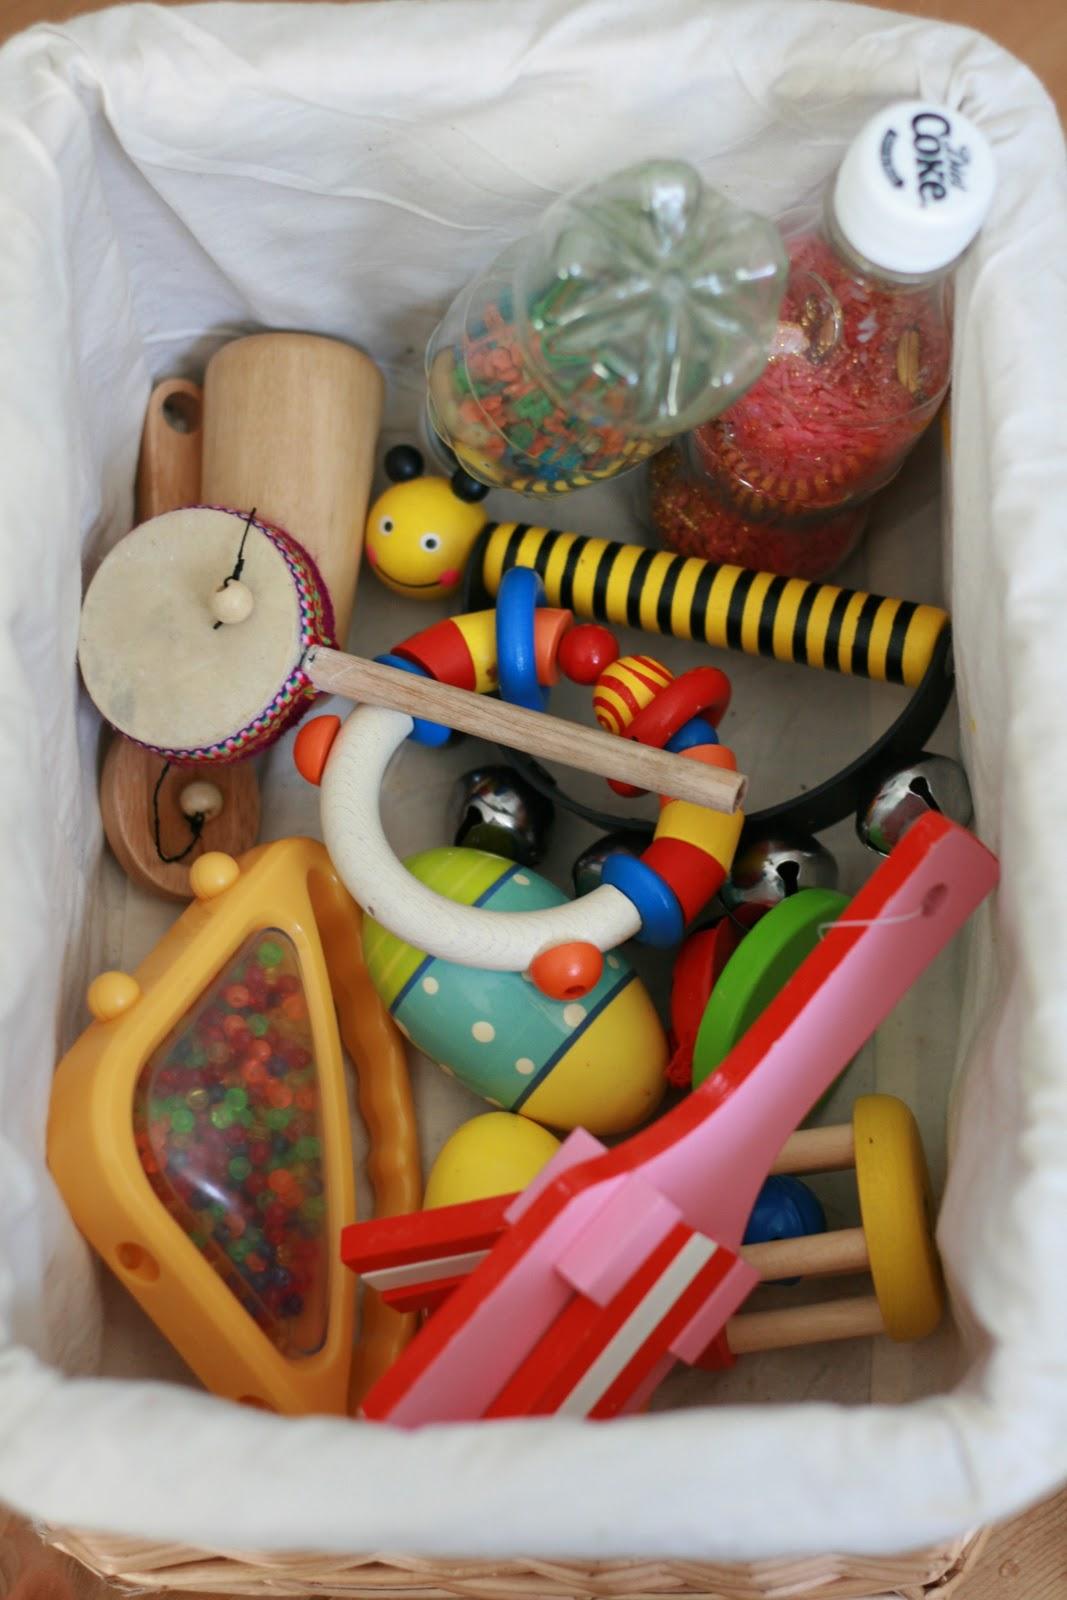 Colour activities babies - Colour Activities Babies 66